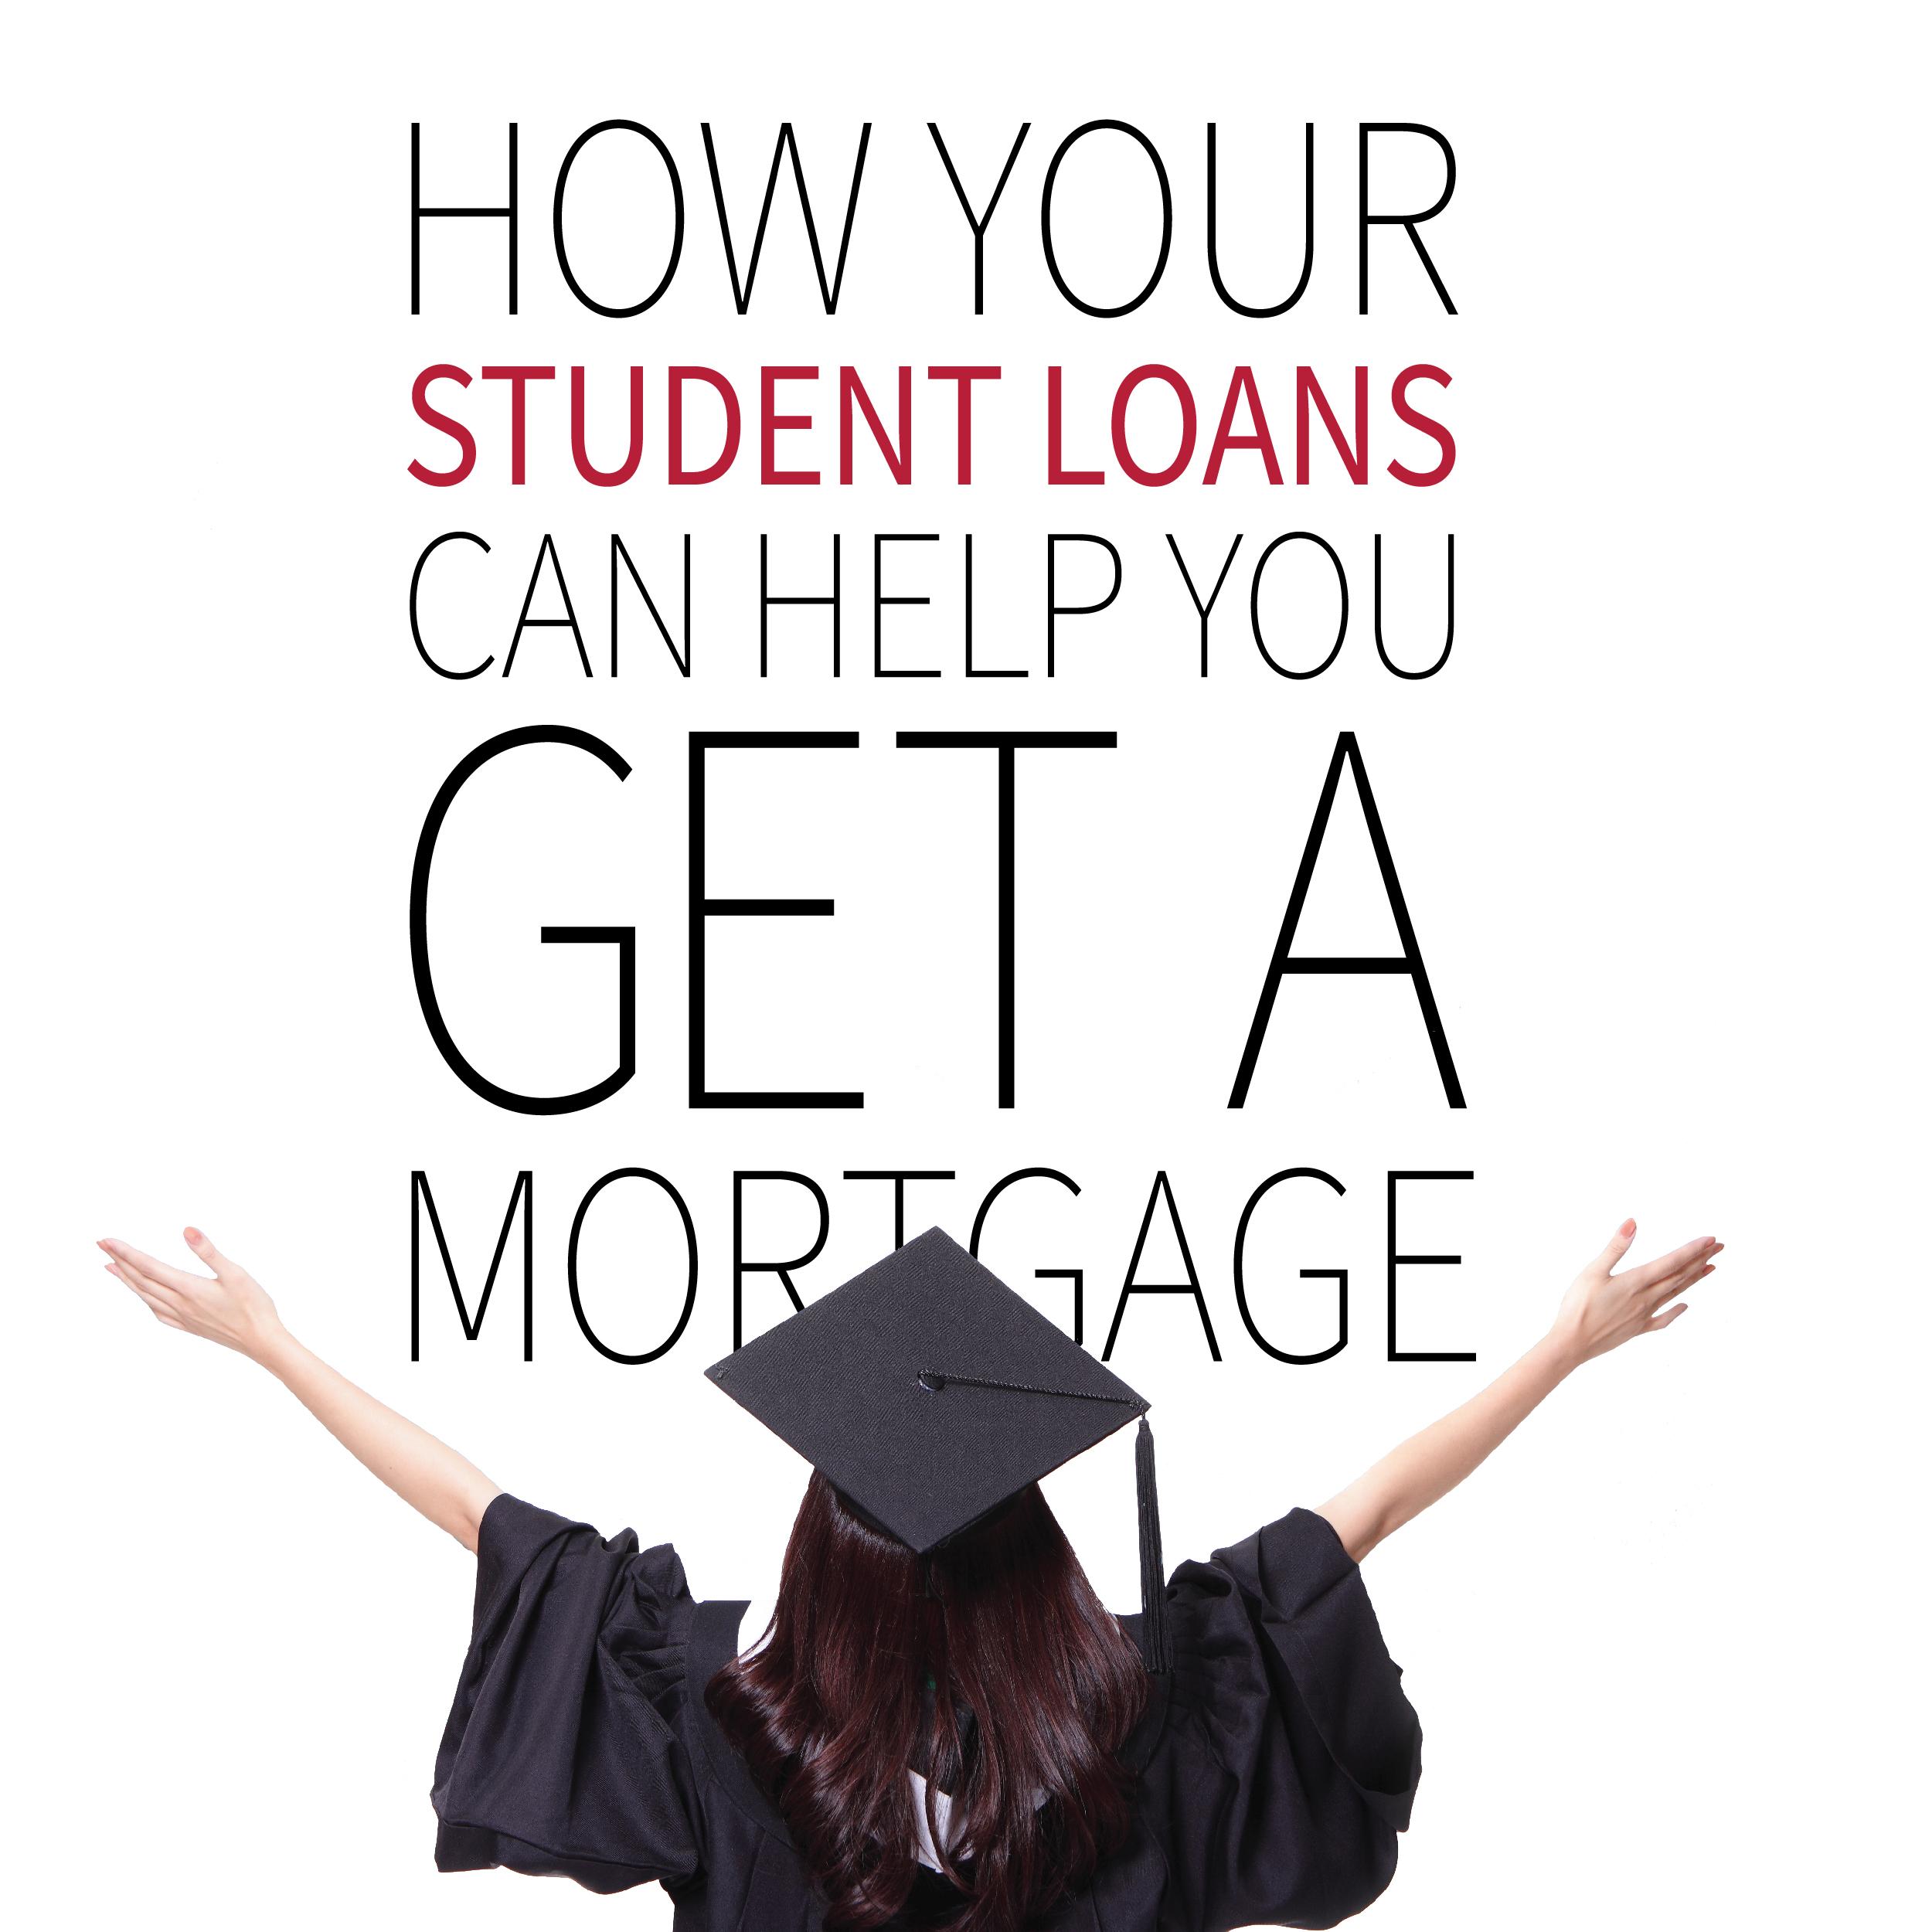 Student_loans_blog_post-01